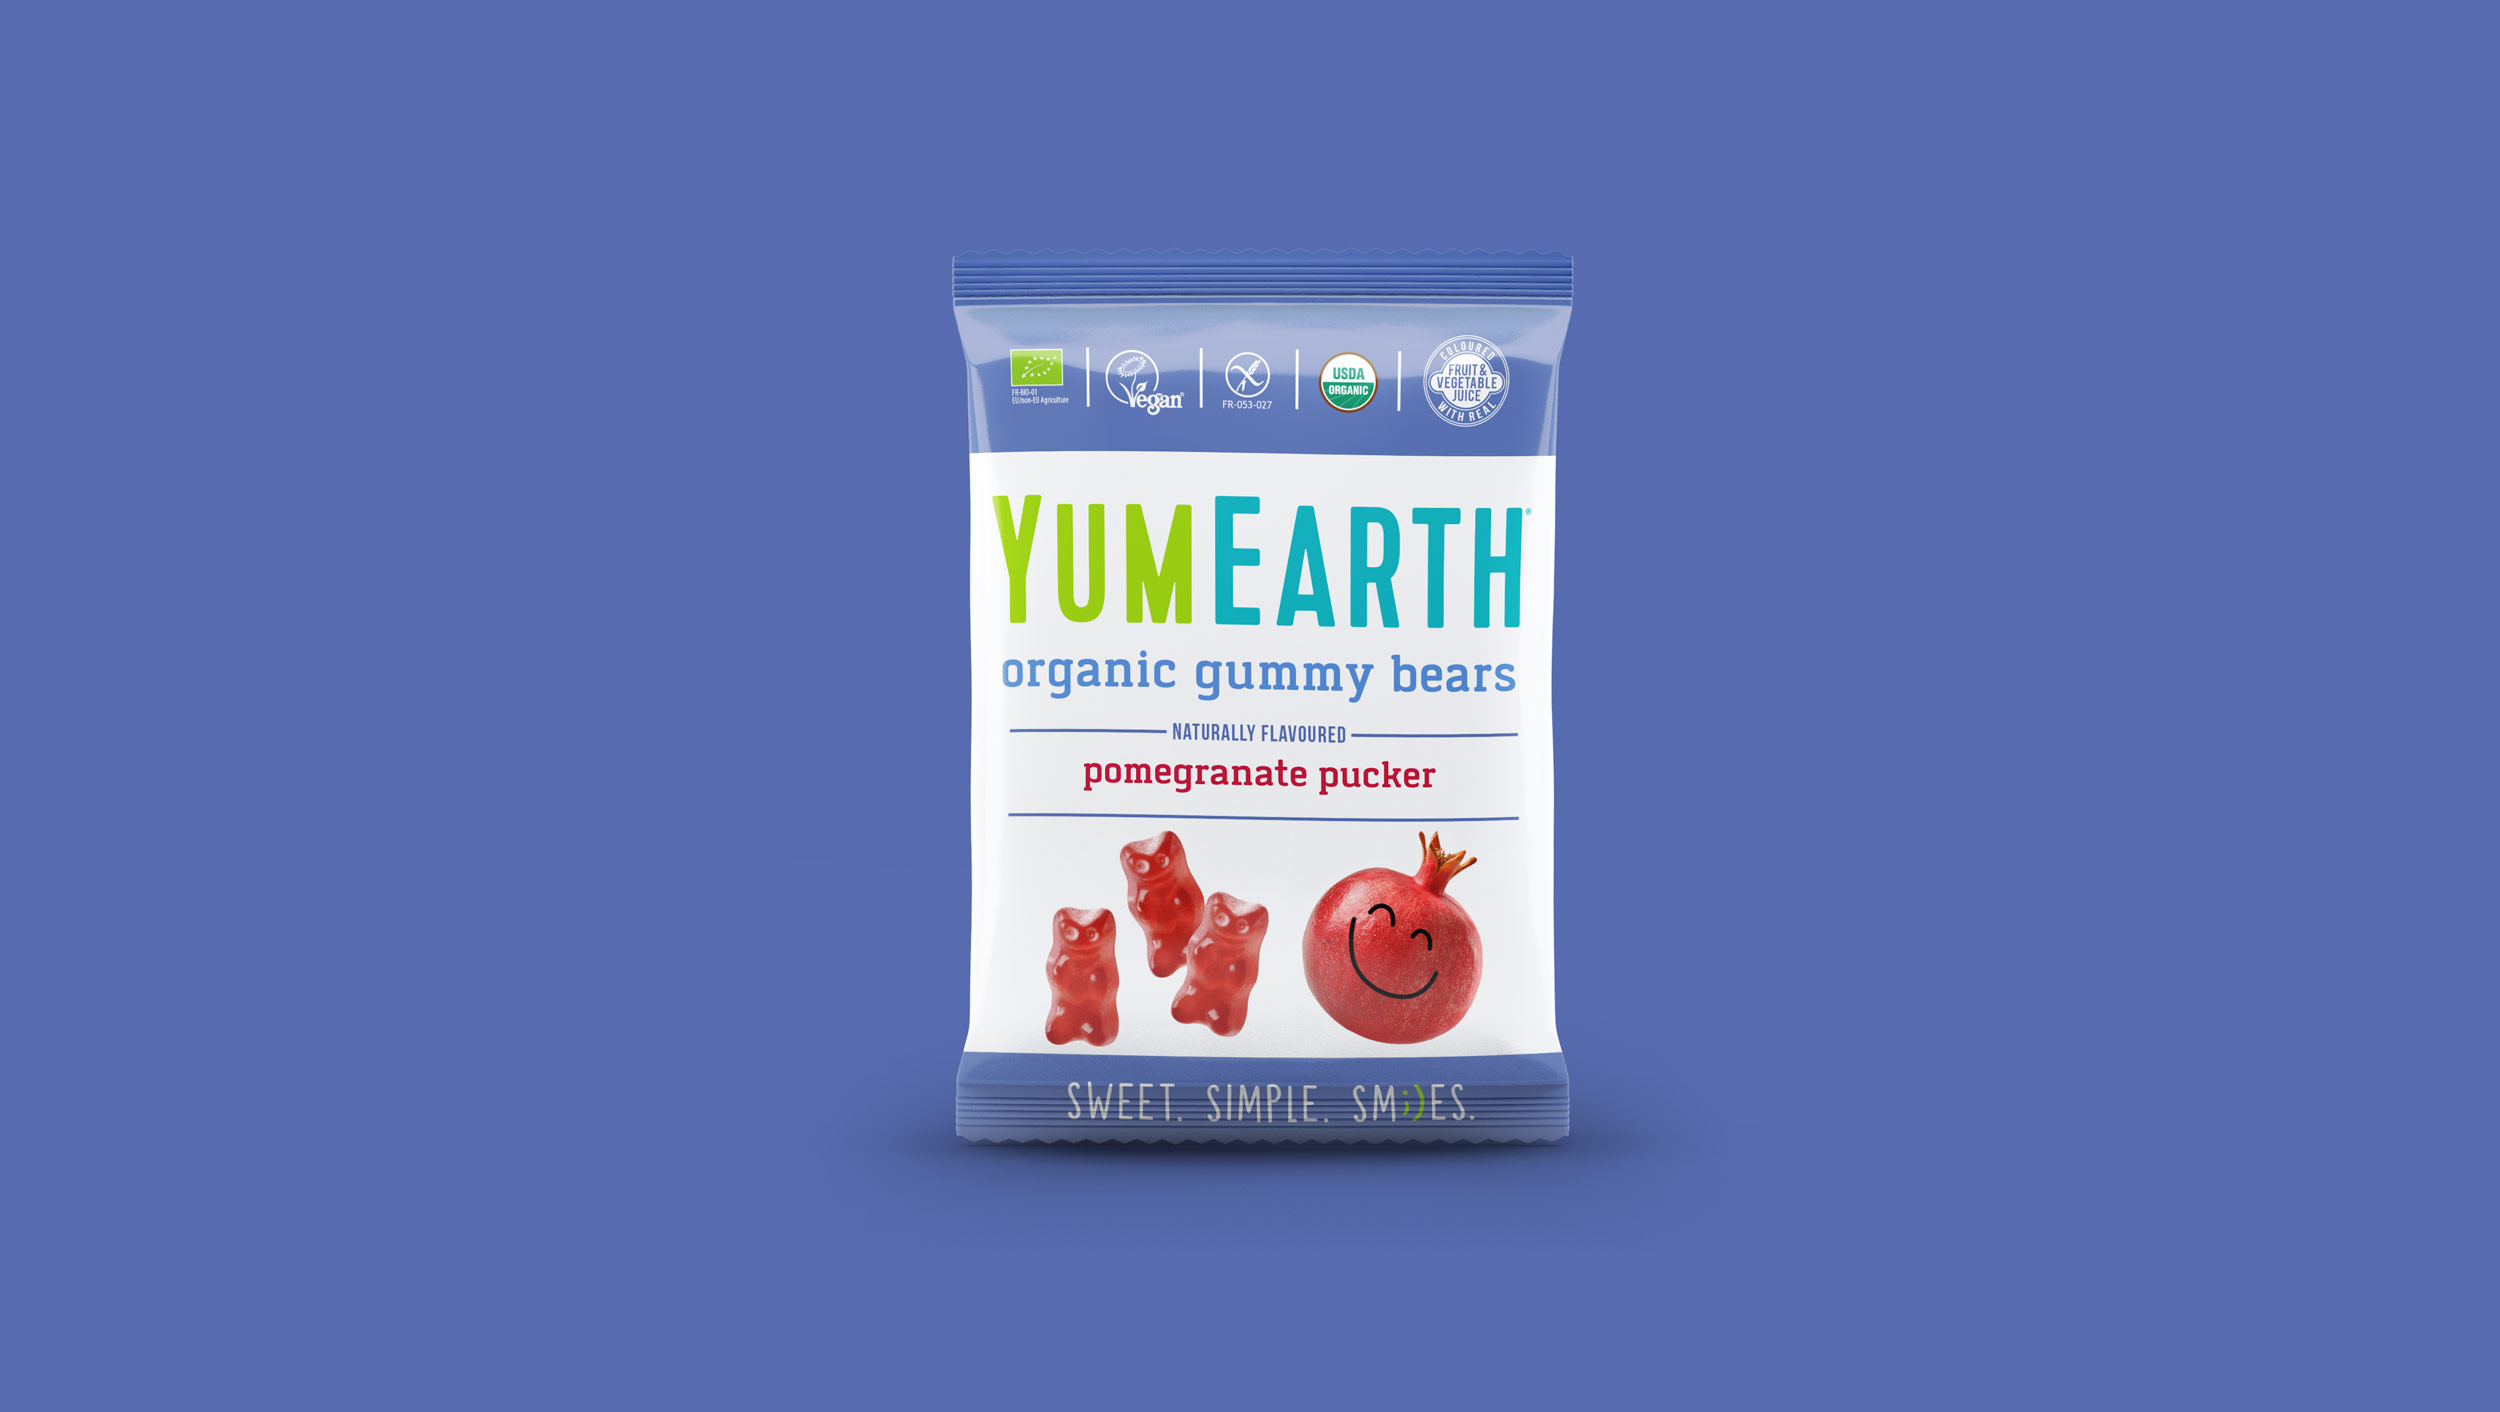 YUM---Gummy-Bears---Pomegrante-Pucker-EMEA-2a.jpg